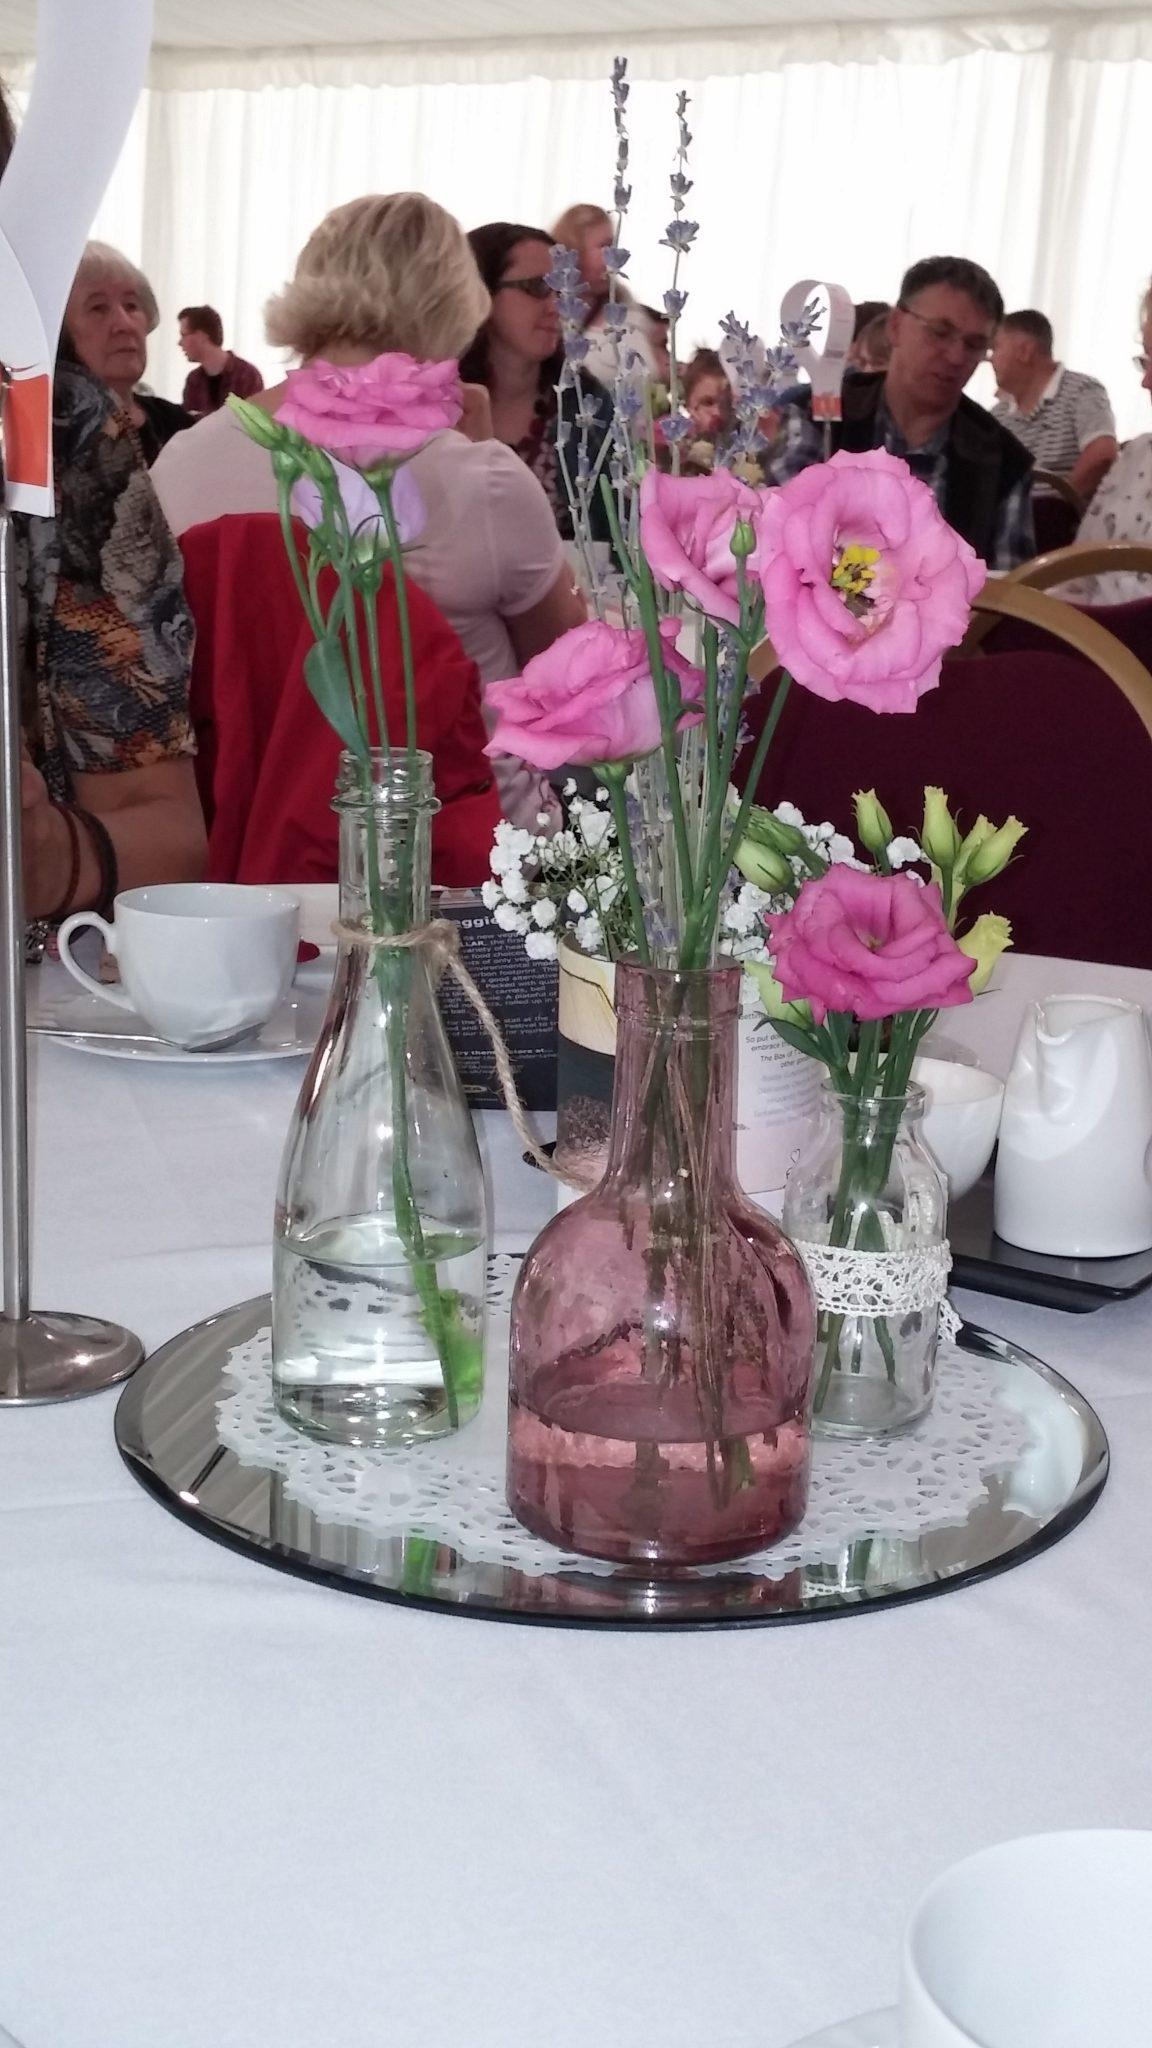 _Slattery vase